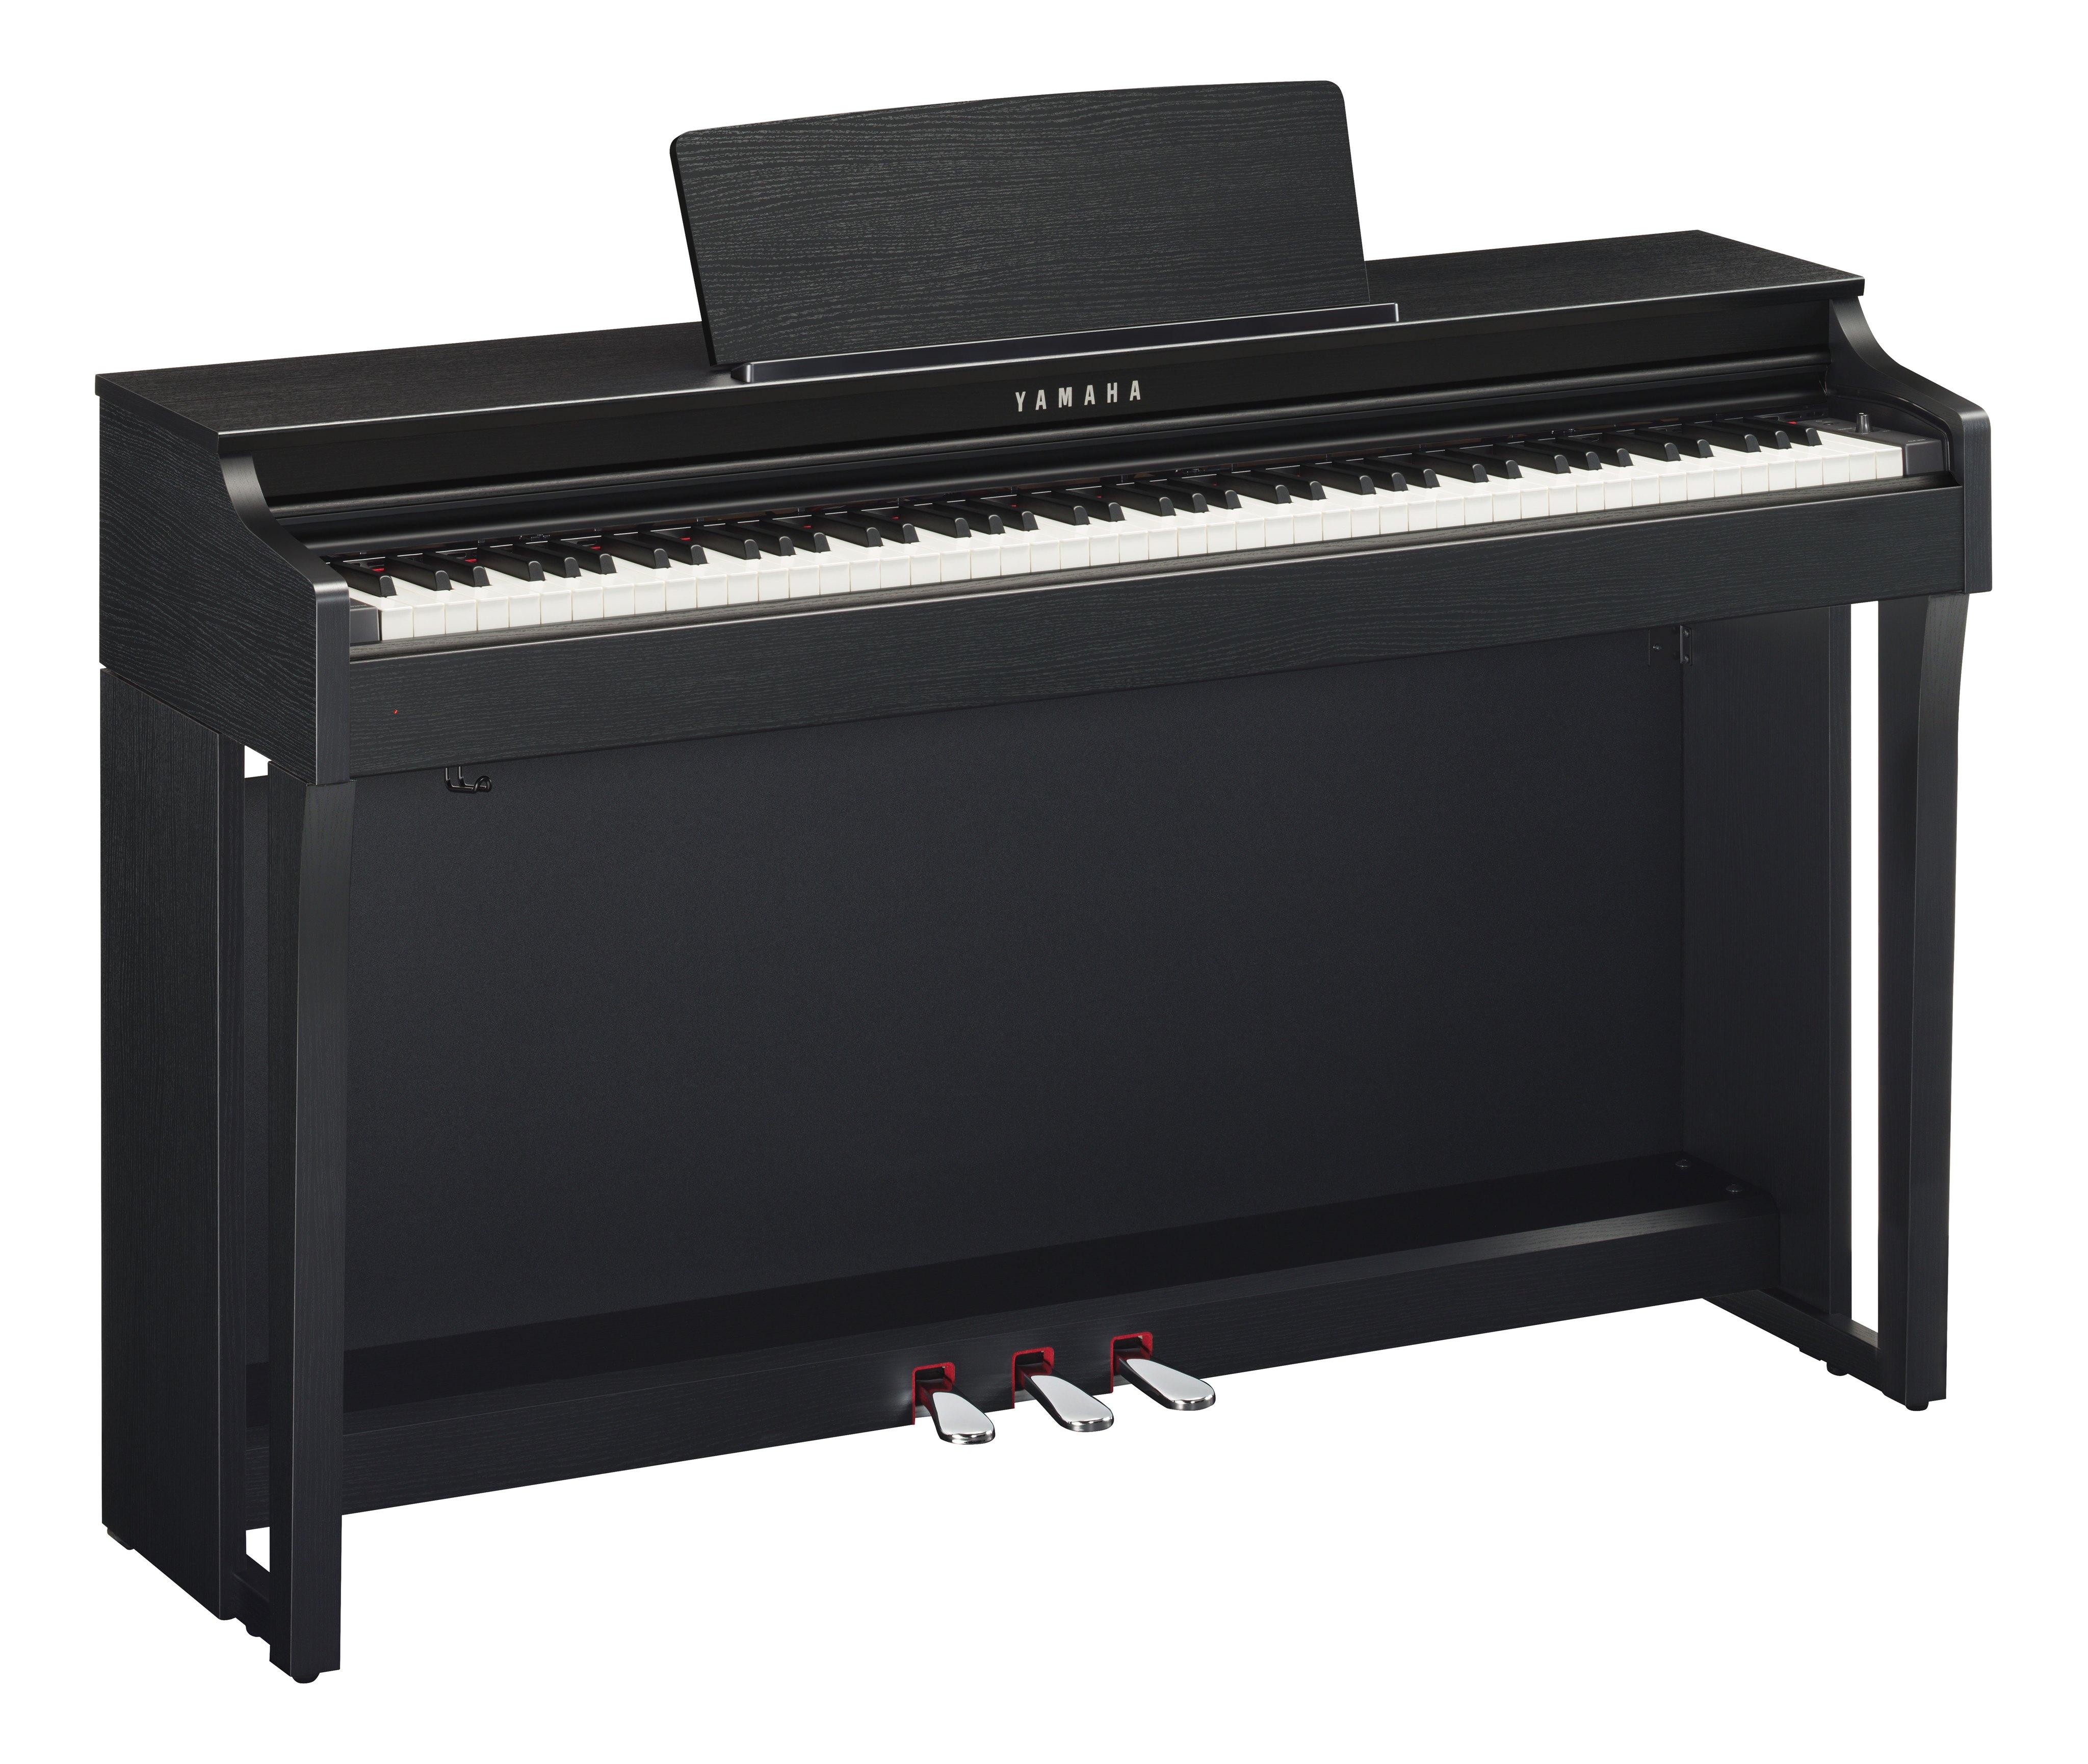 Yamaha Clavinova<br/>CLP-625 <br/>5 Jahre Garantie<br/>NEW